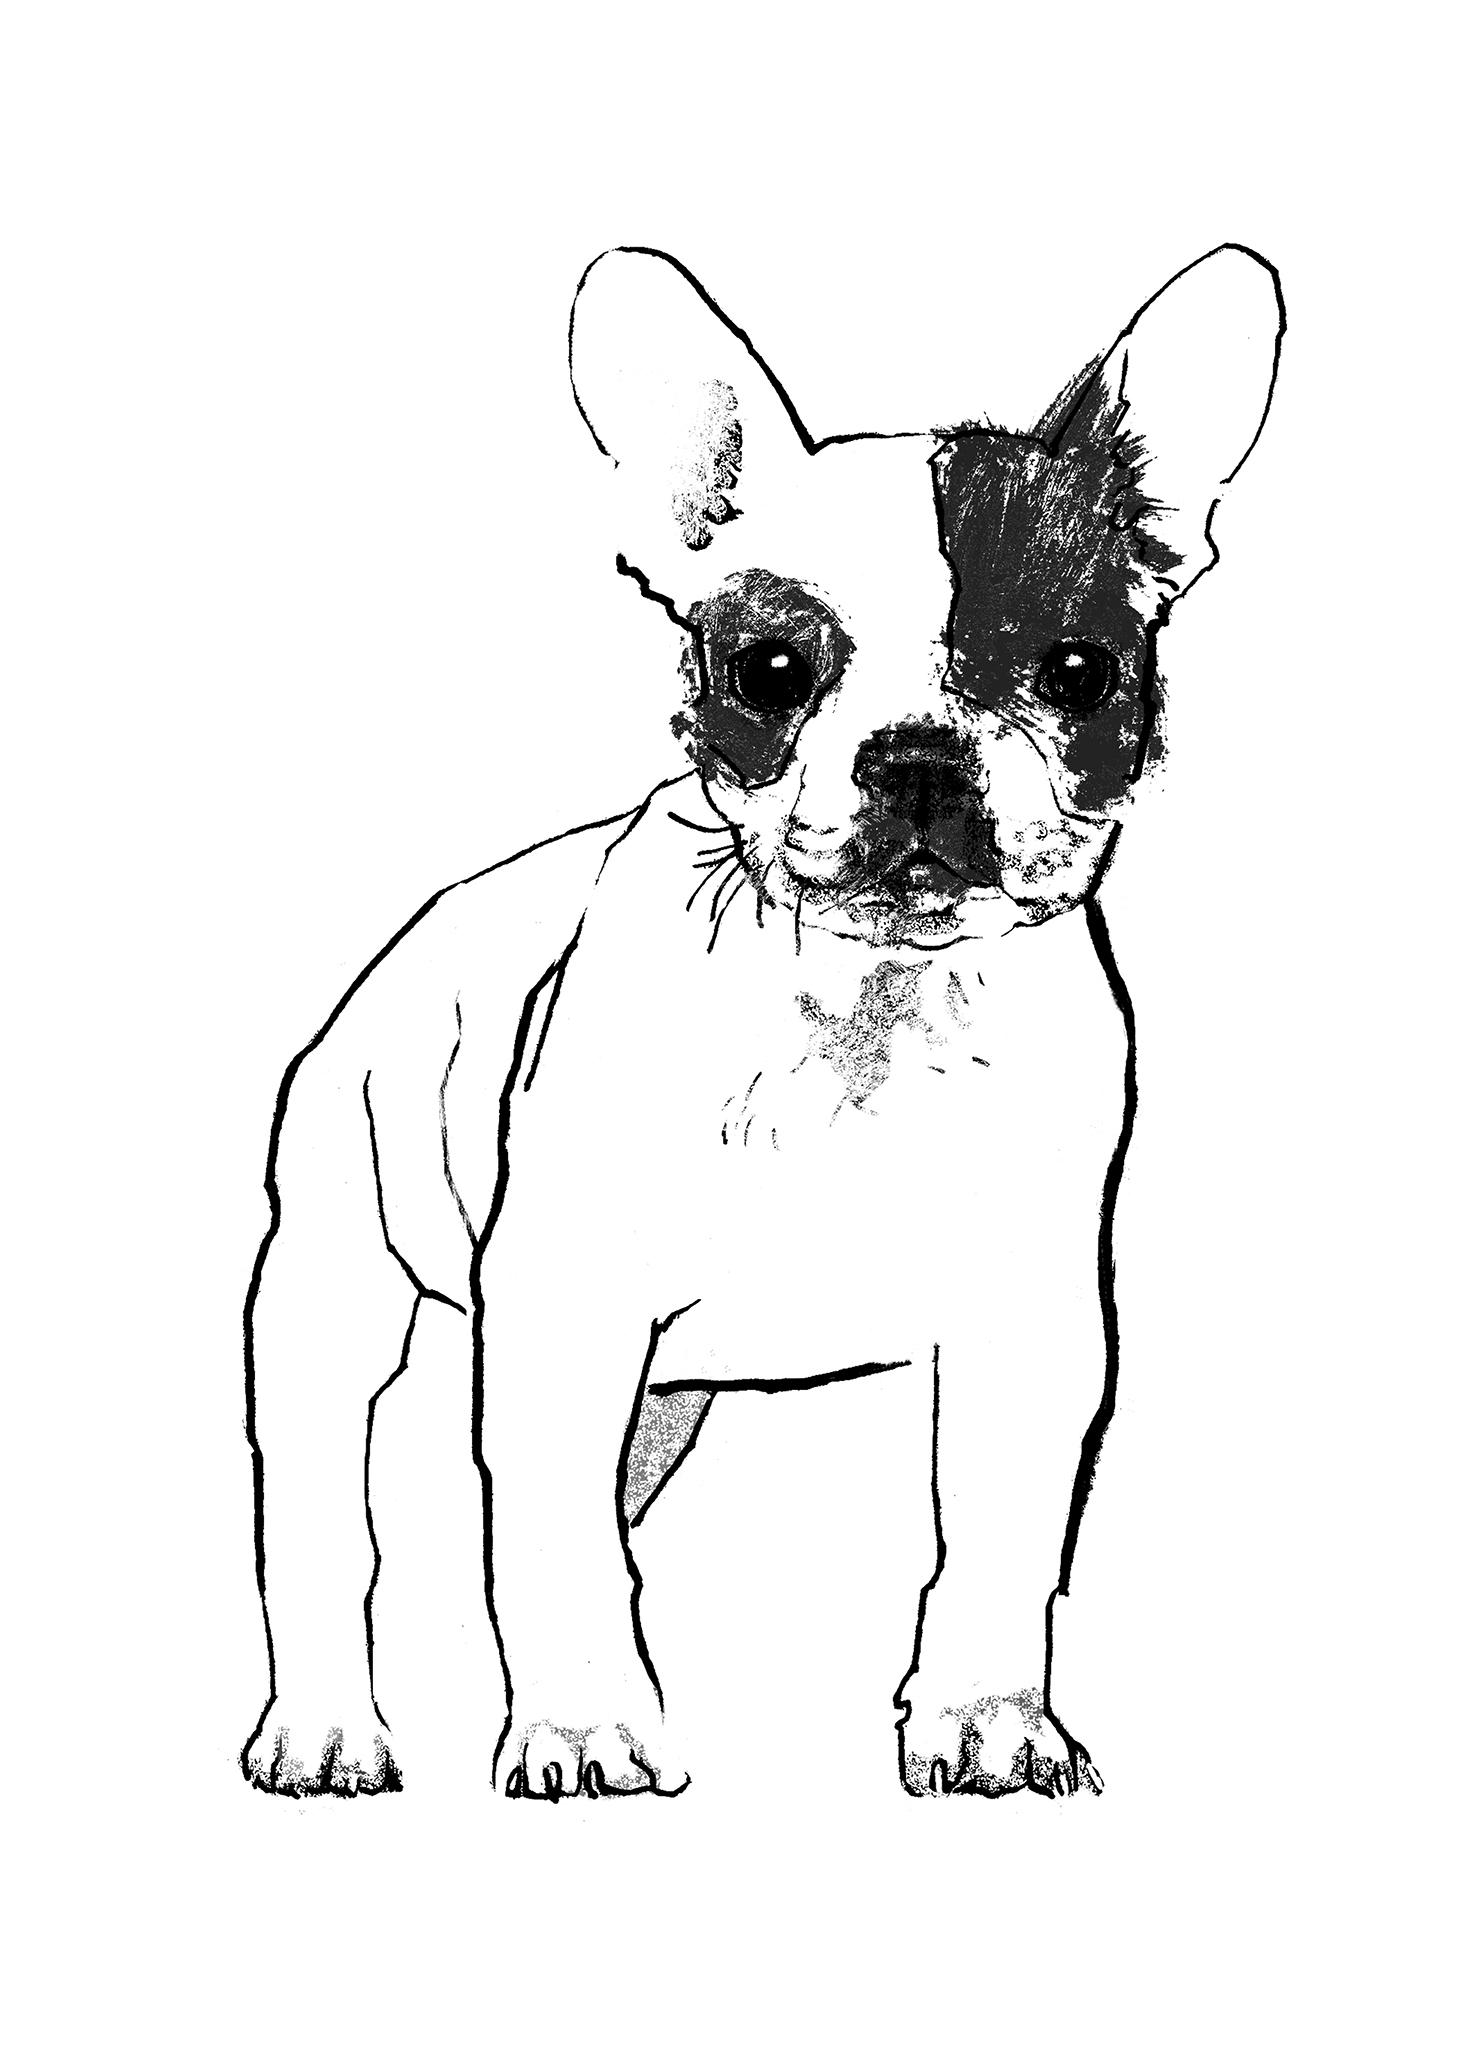 Uncategorized Bulldog Pictures To Print french bulldog print club london tiff howick bulldog